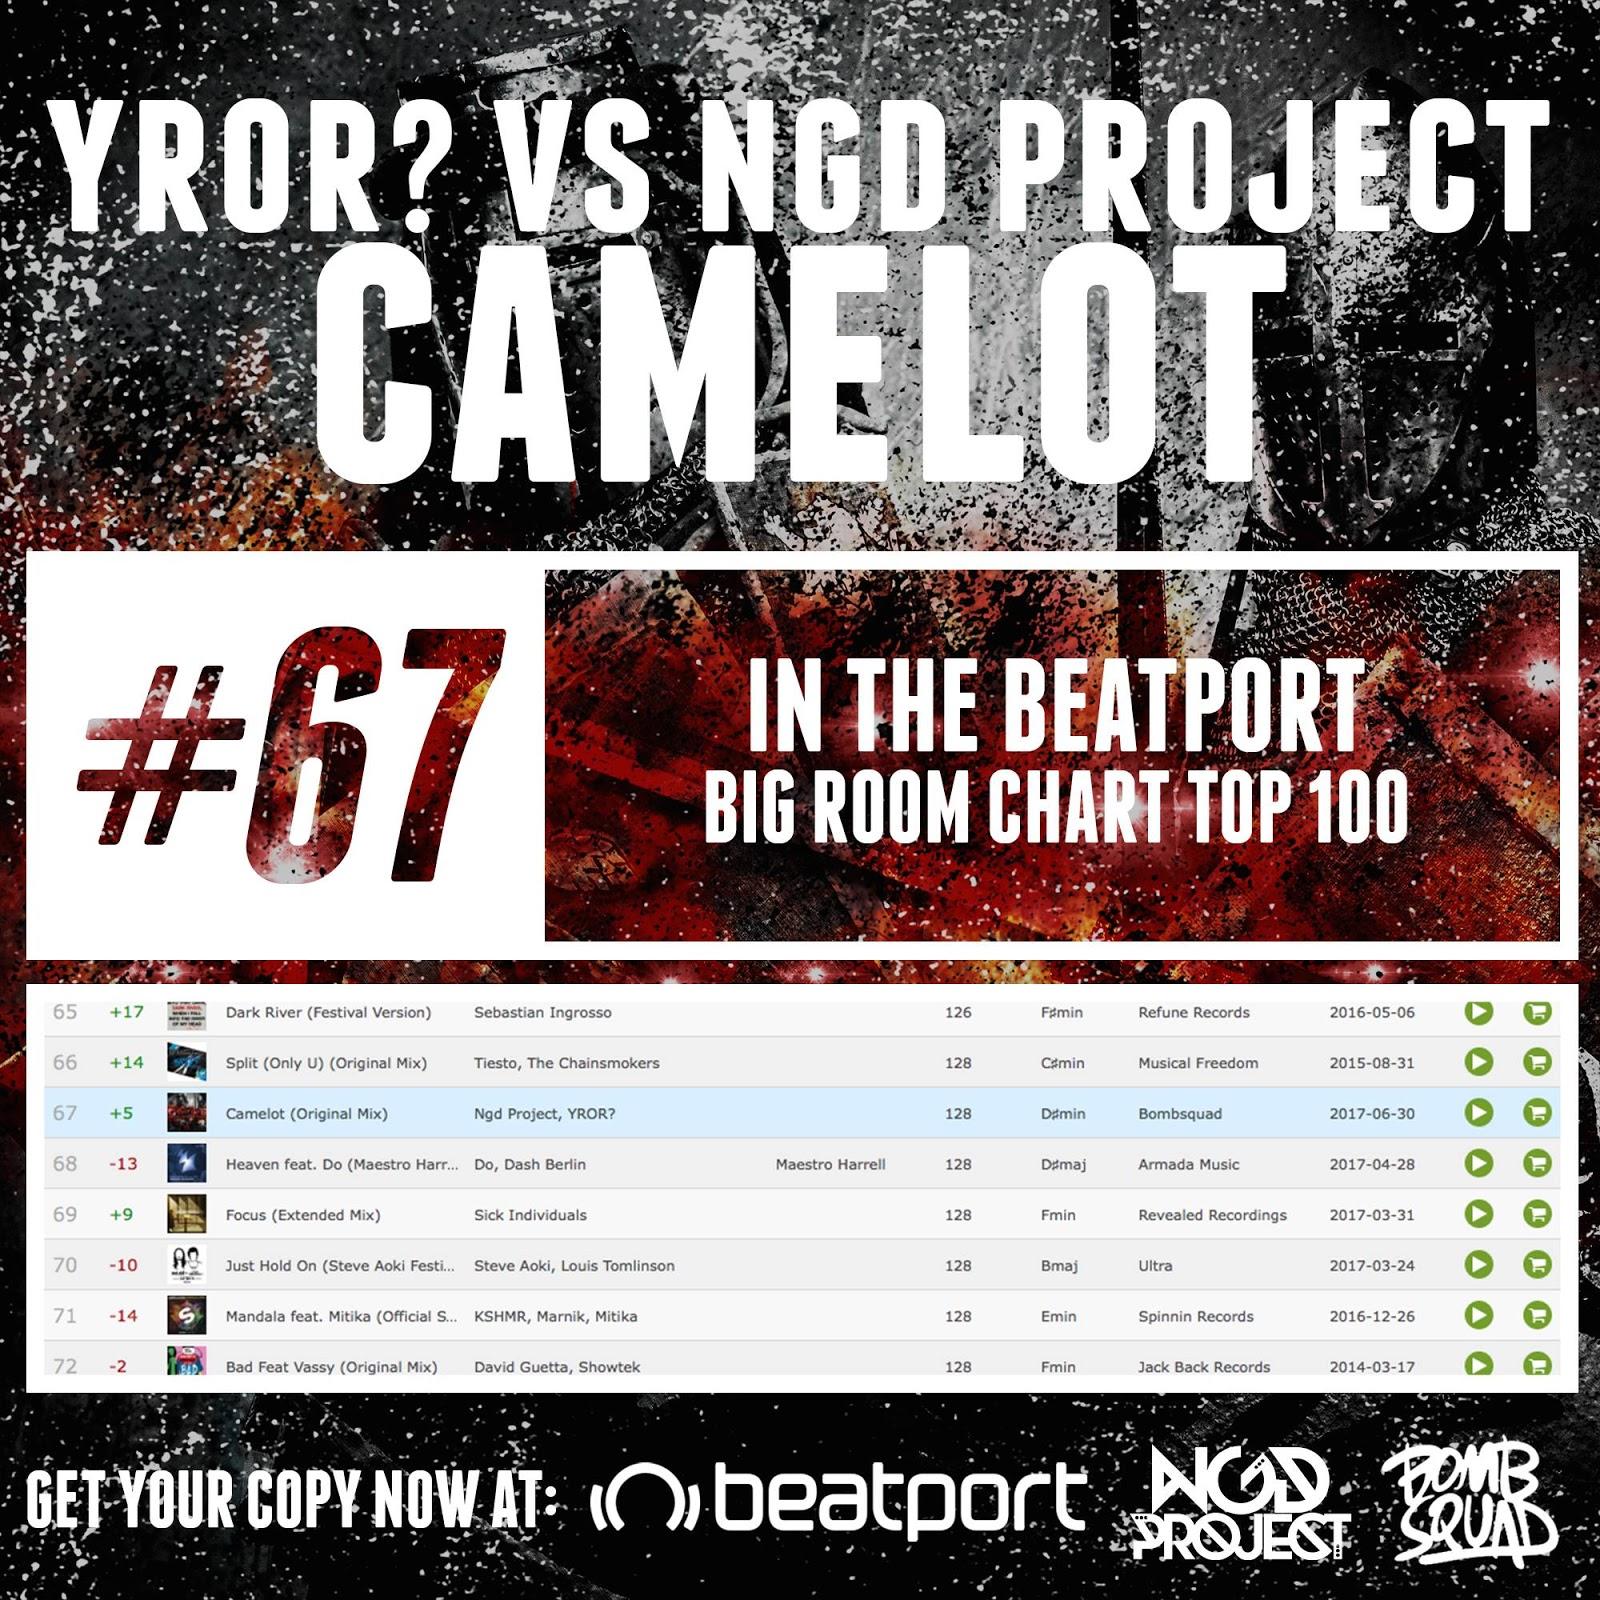 NGD Project Michael Gadani Alberto Tavanti YROR Camelot